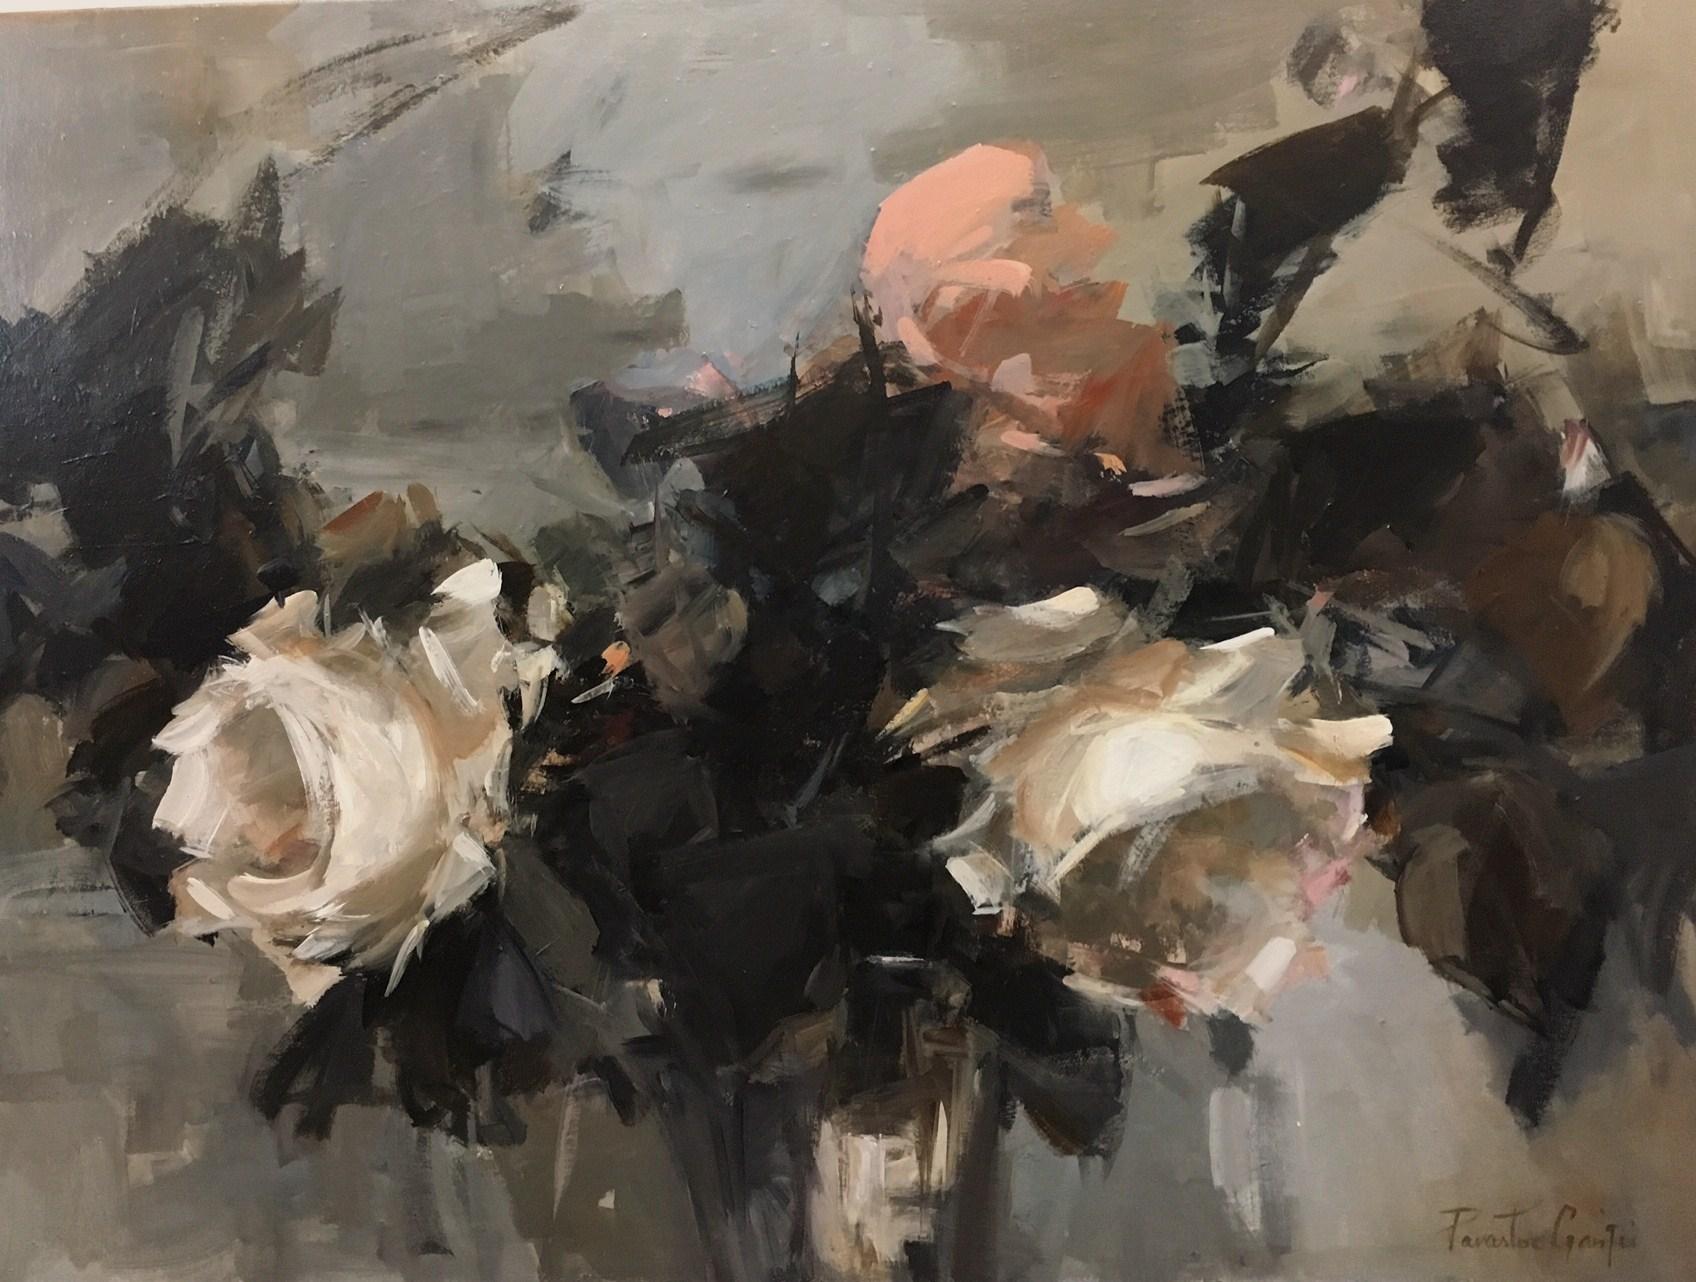 Parastoo Ganjei, Too complicated, acrylic on canvas, 101 cm x 76 cm,  http://www.parastooganjei.com